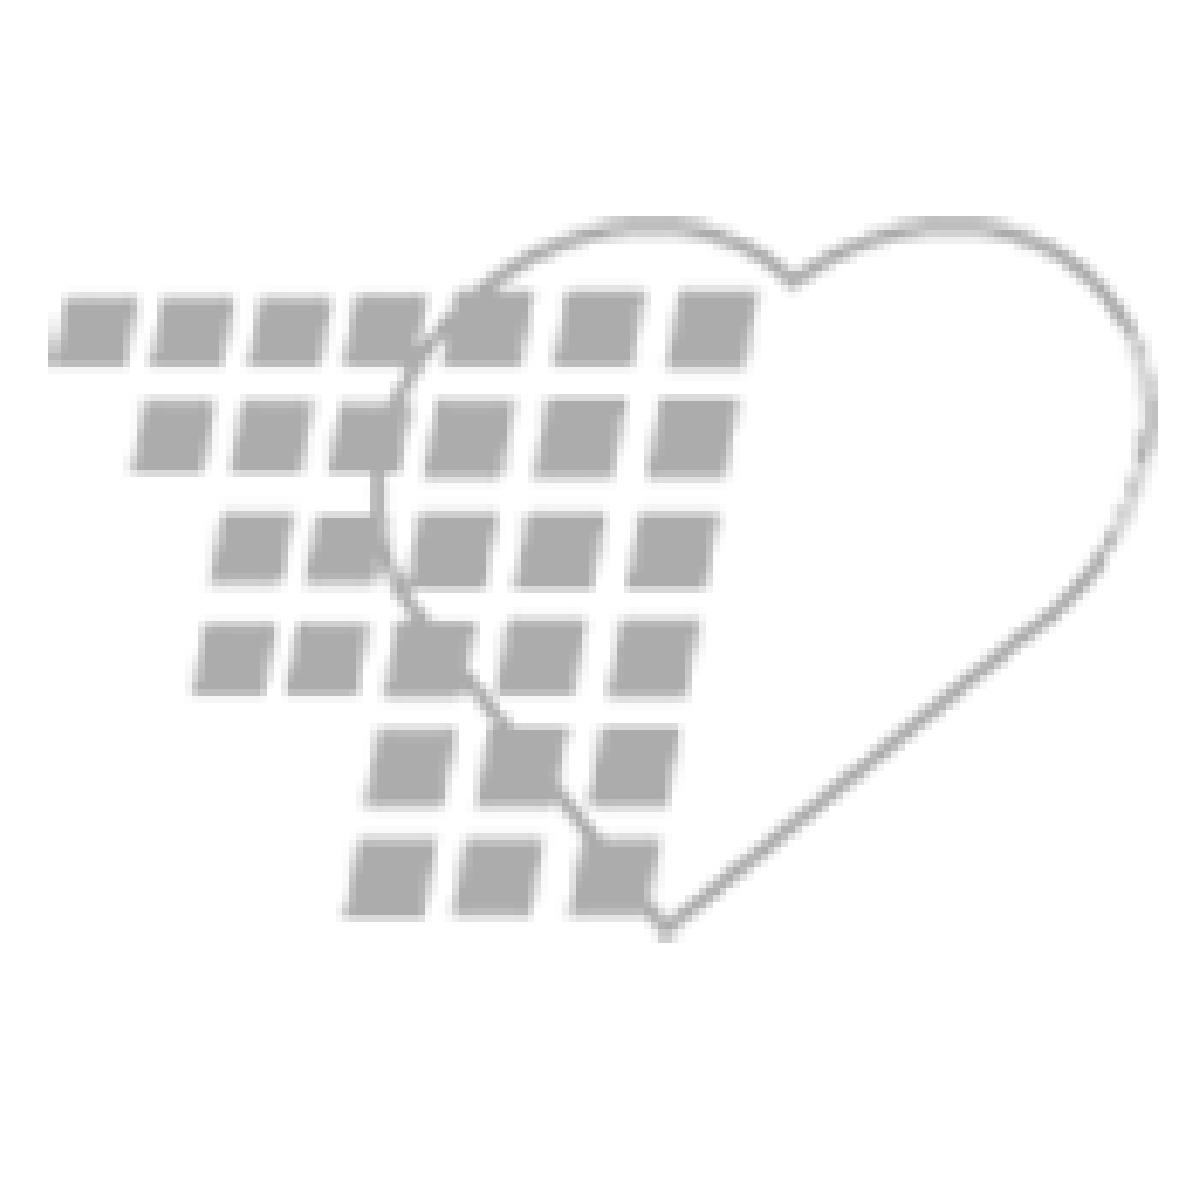 06-82-8130 Assure ID Safety Pen Needles